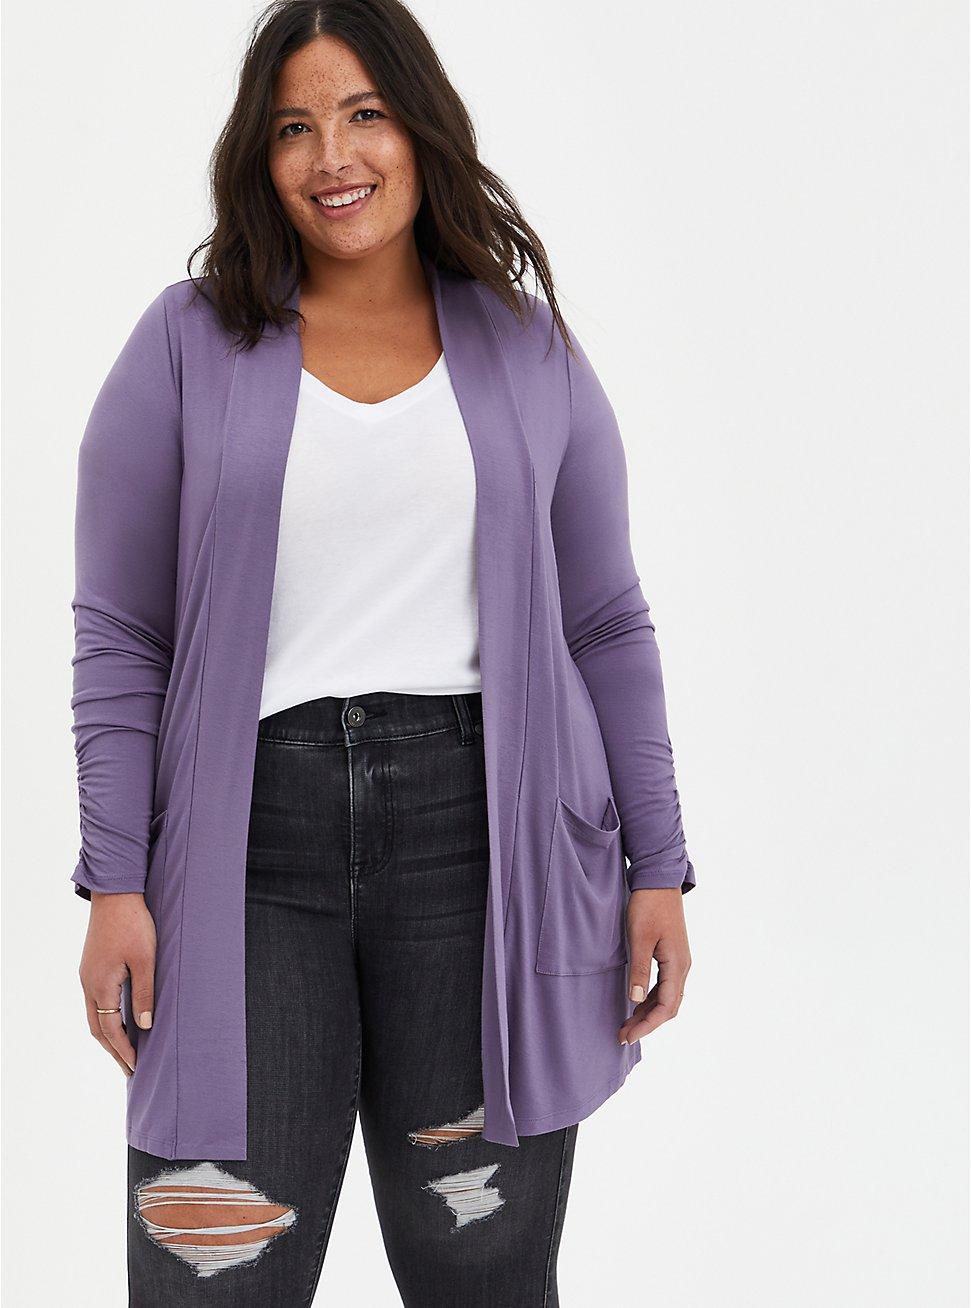 Open Cardigan Sweater - Super Soft Purple, PURPLE, hi-res